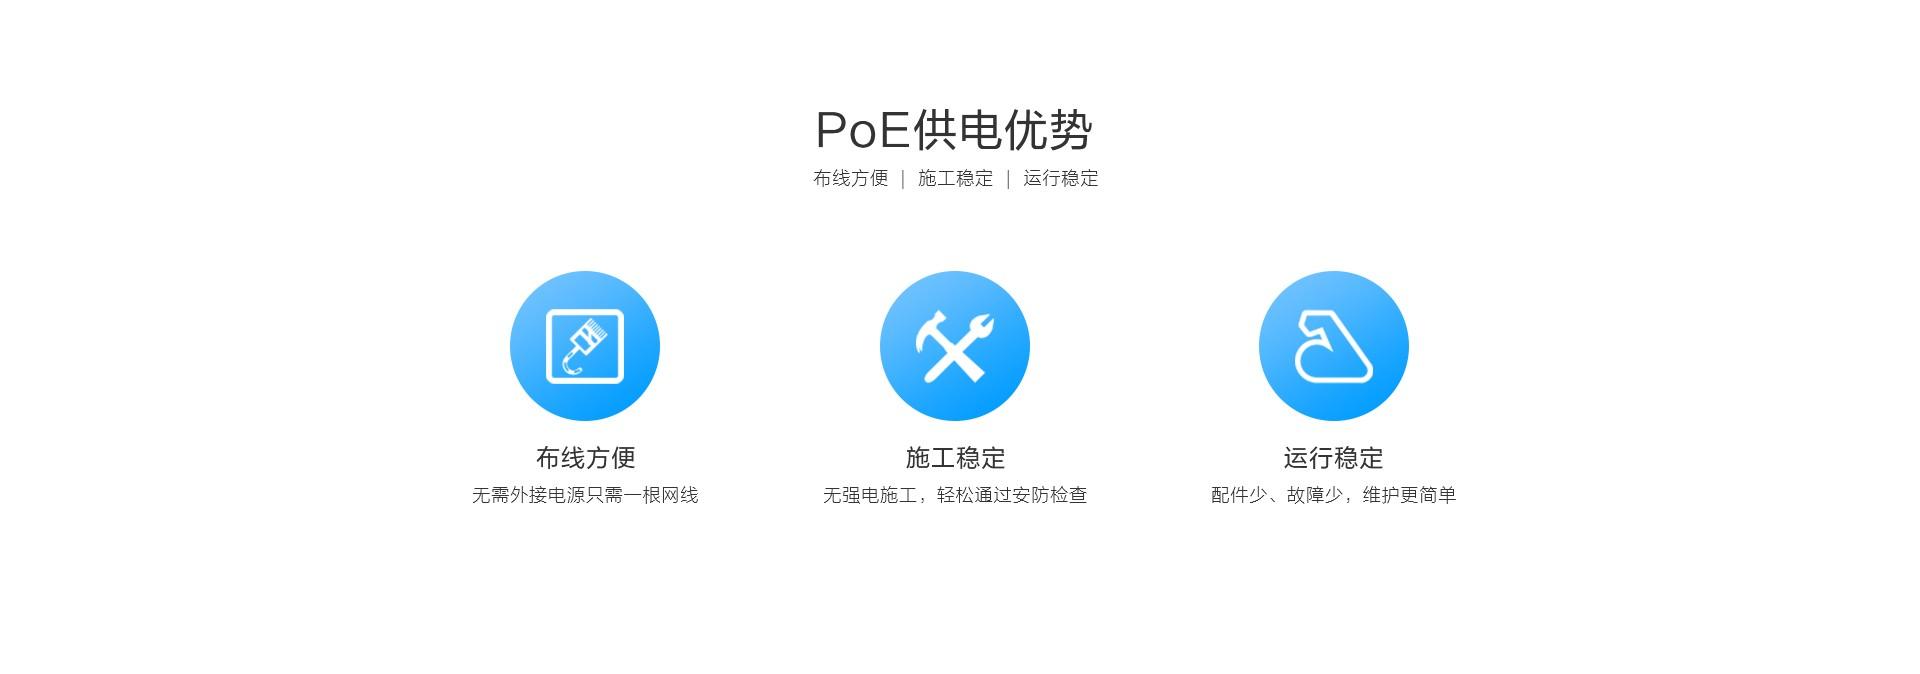 W6-8路-web_06.jpg